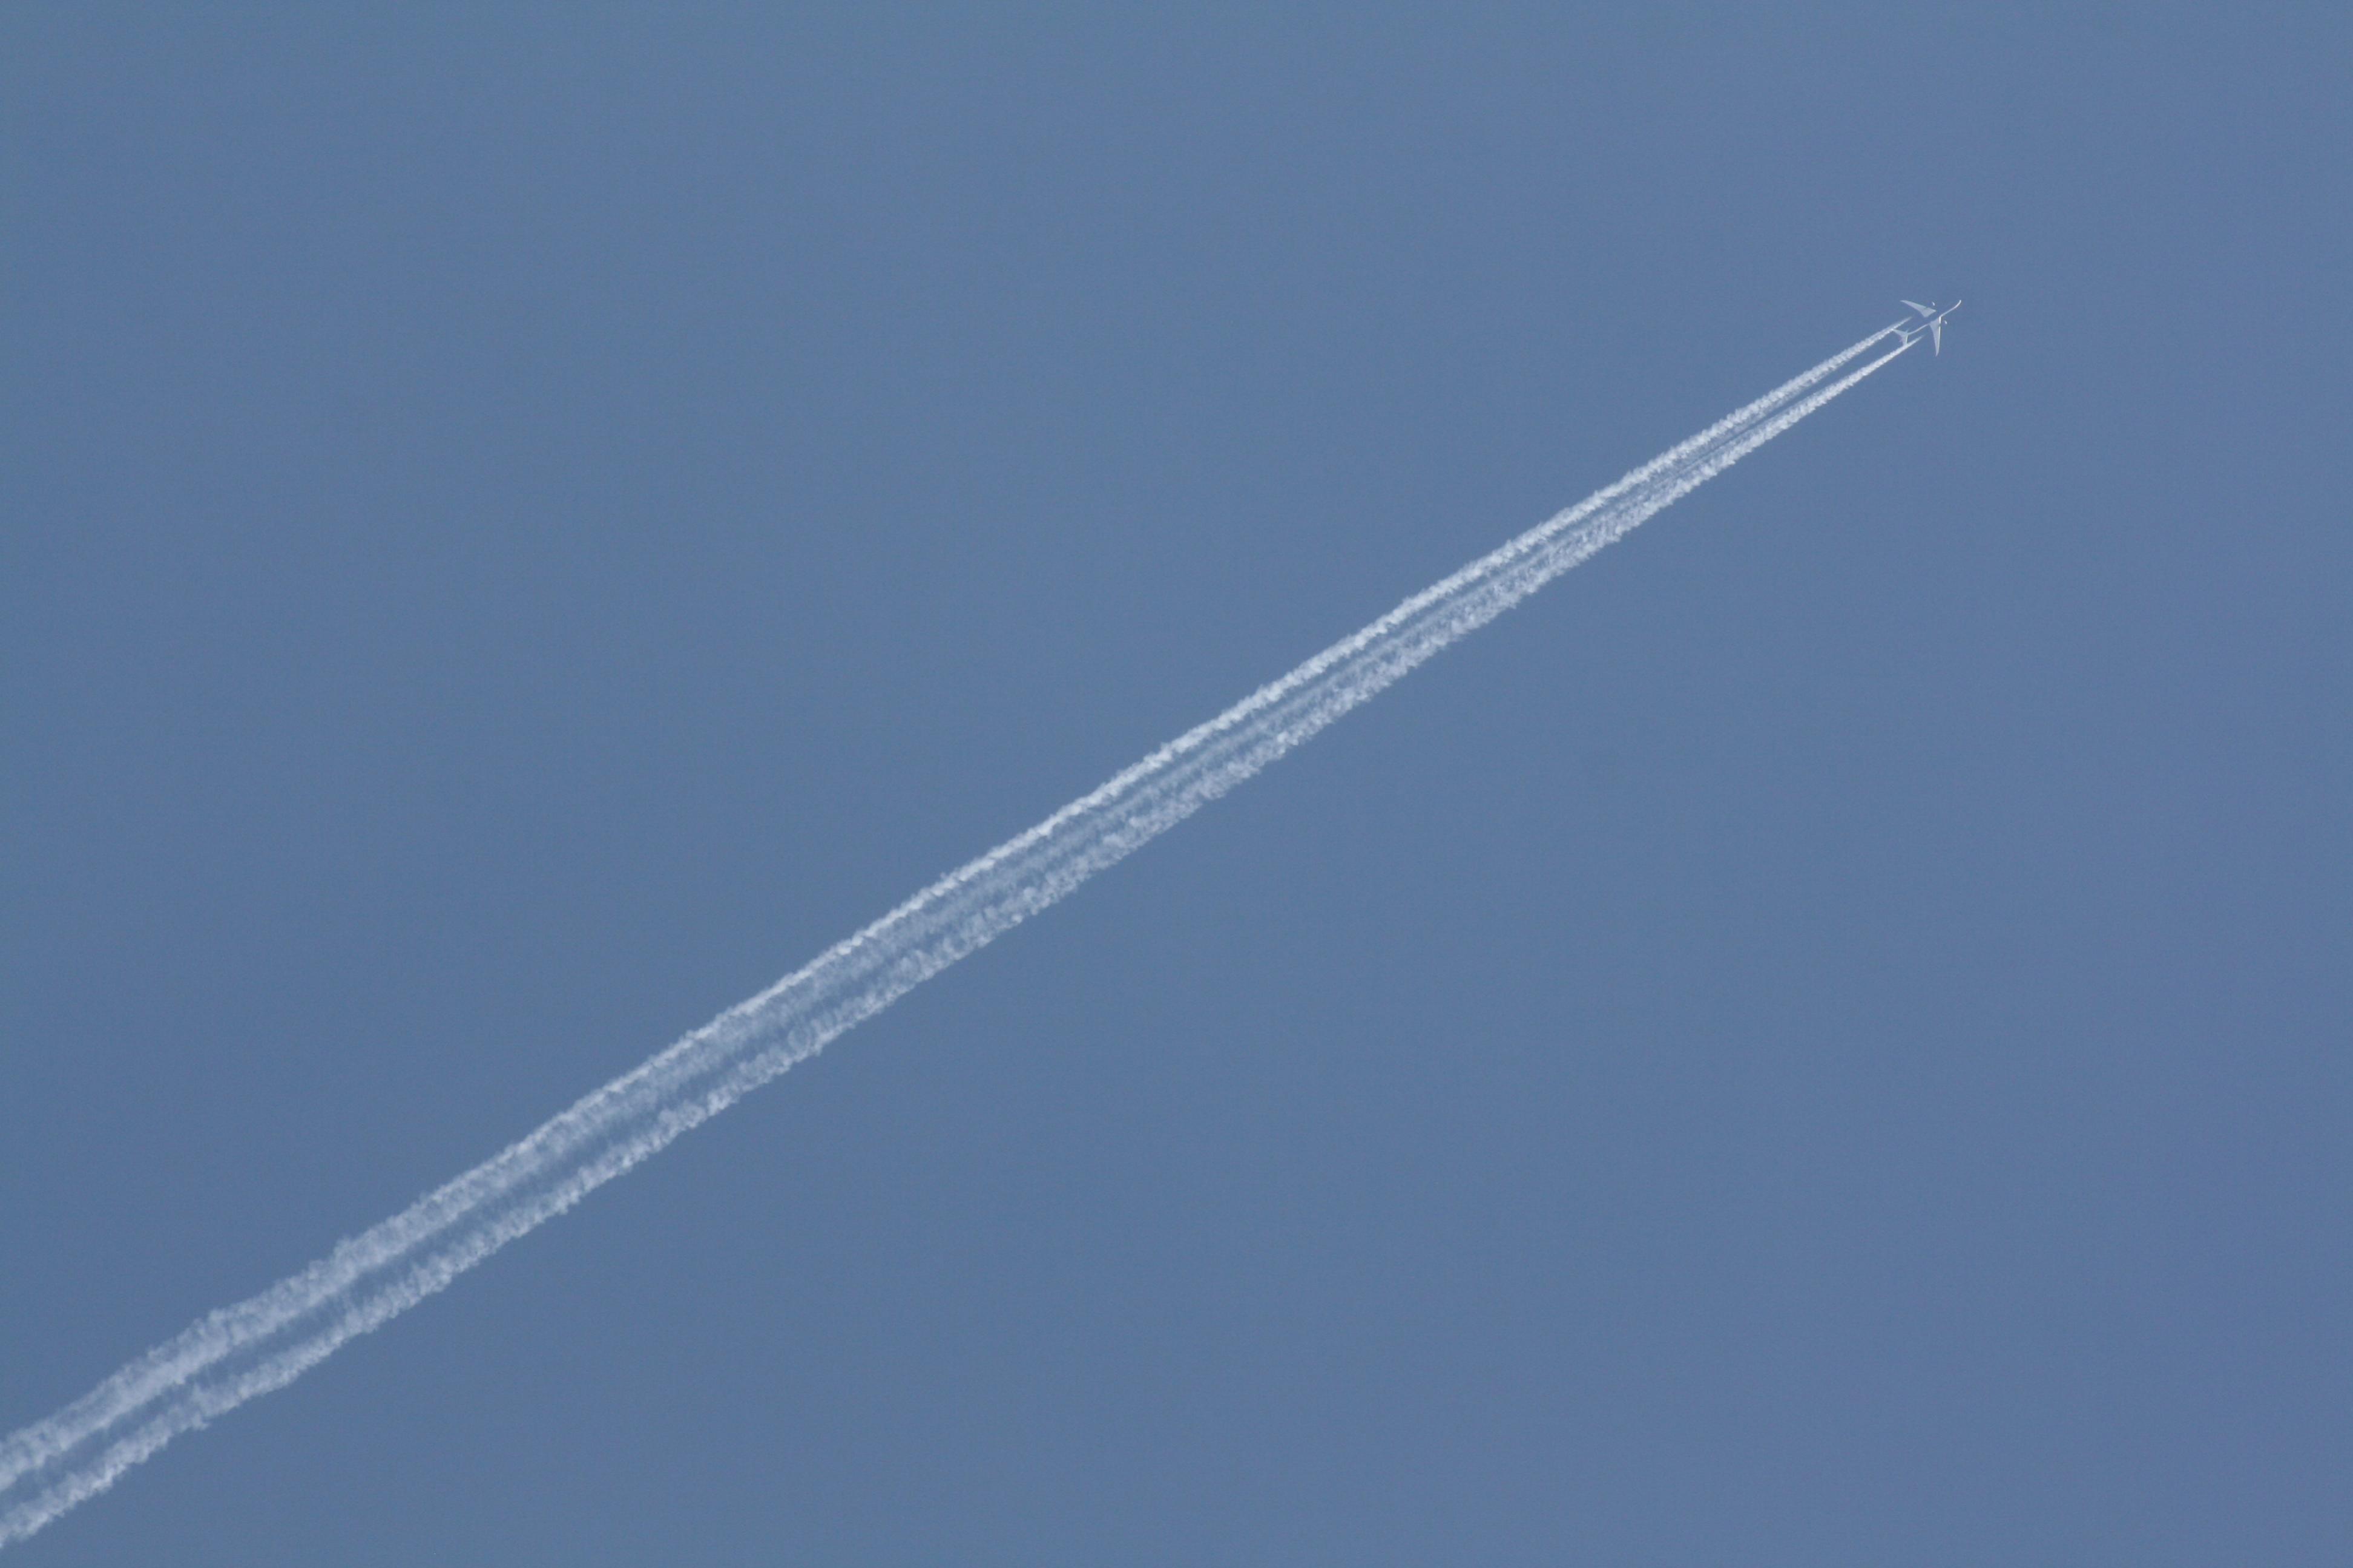 Naam: Boeing backgarden.jpg Bekeken: 592 Grootte: 391,7 KB